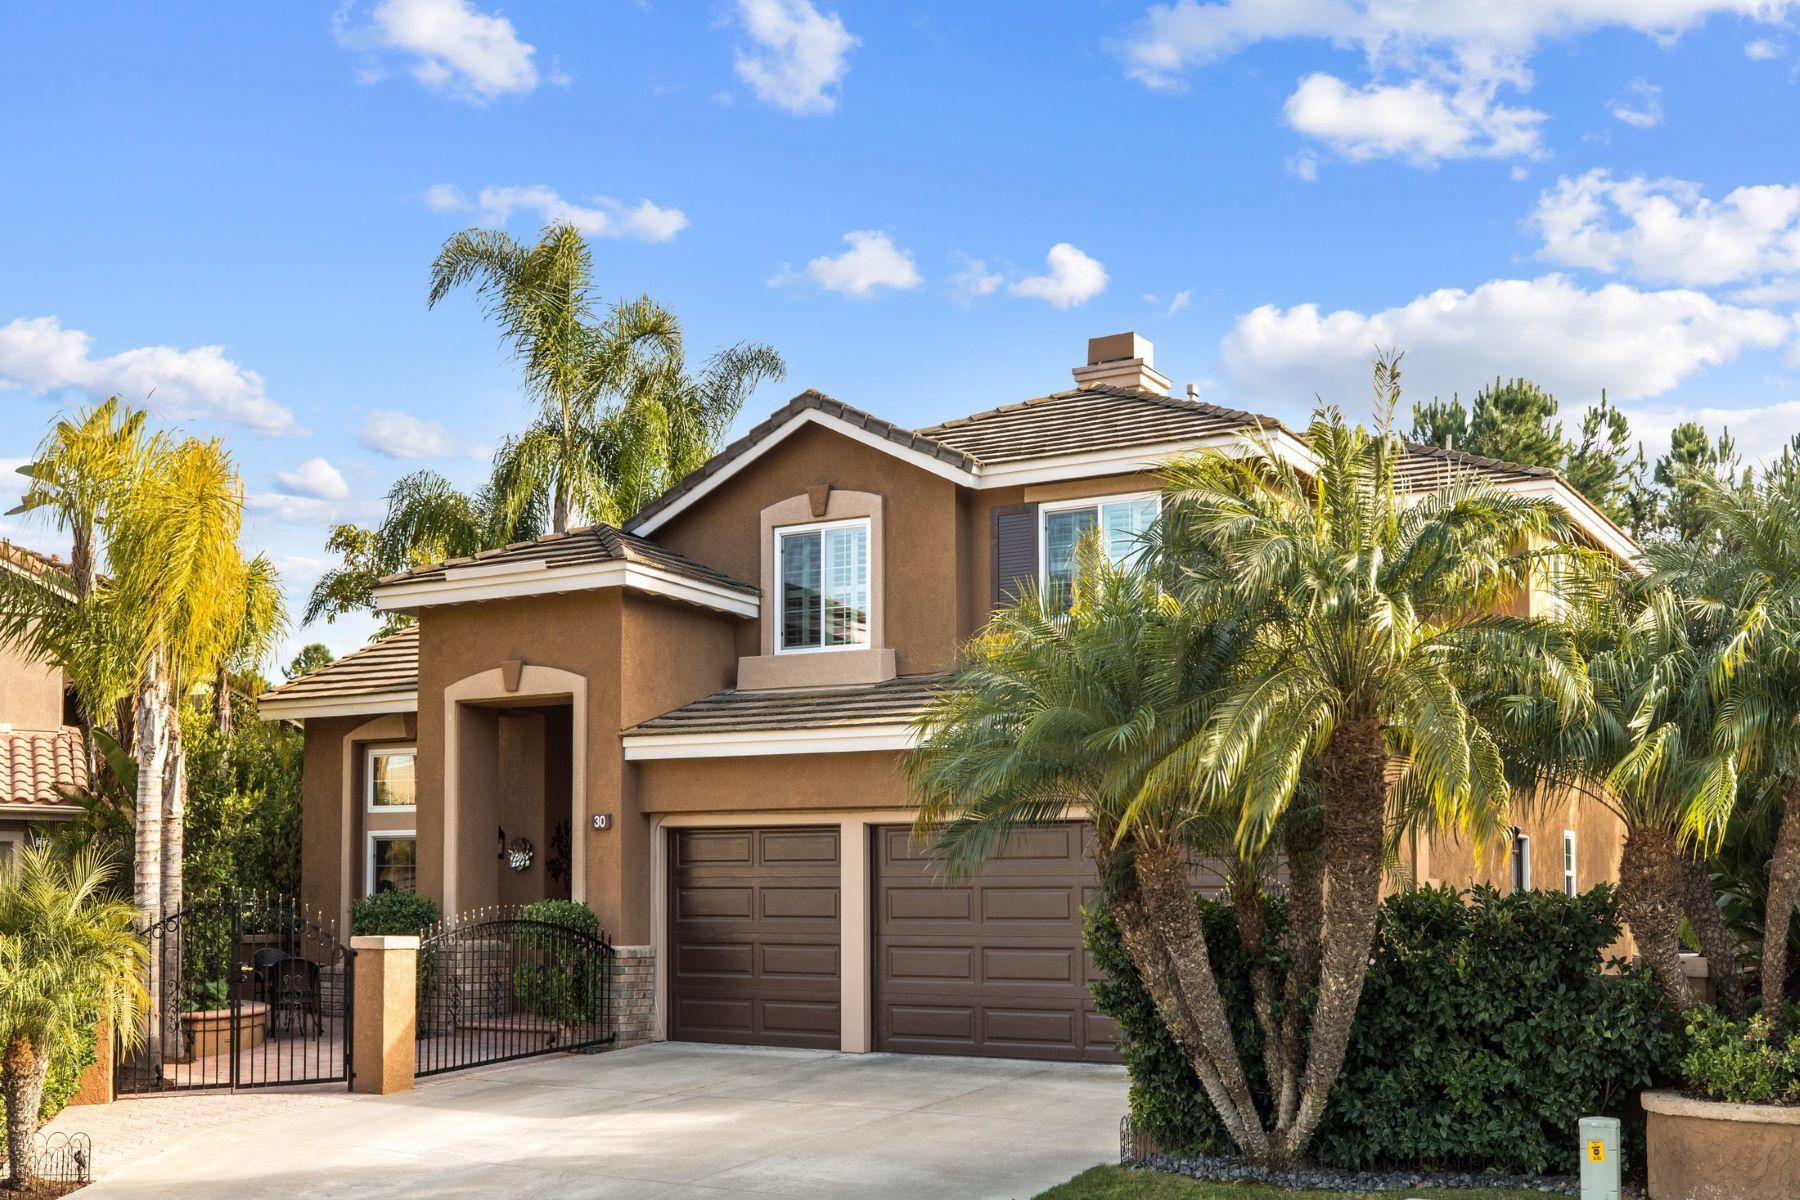 Single Family Homes para Venda às 30 Blue Jay Drive, Aliso Viejo Aliso Viejo, Califórnia 92656 Estados Unidos